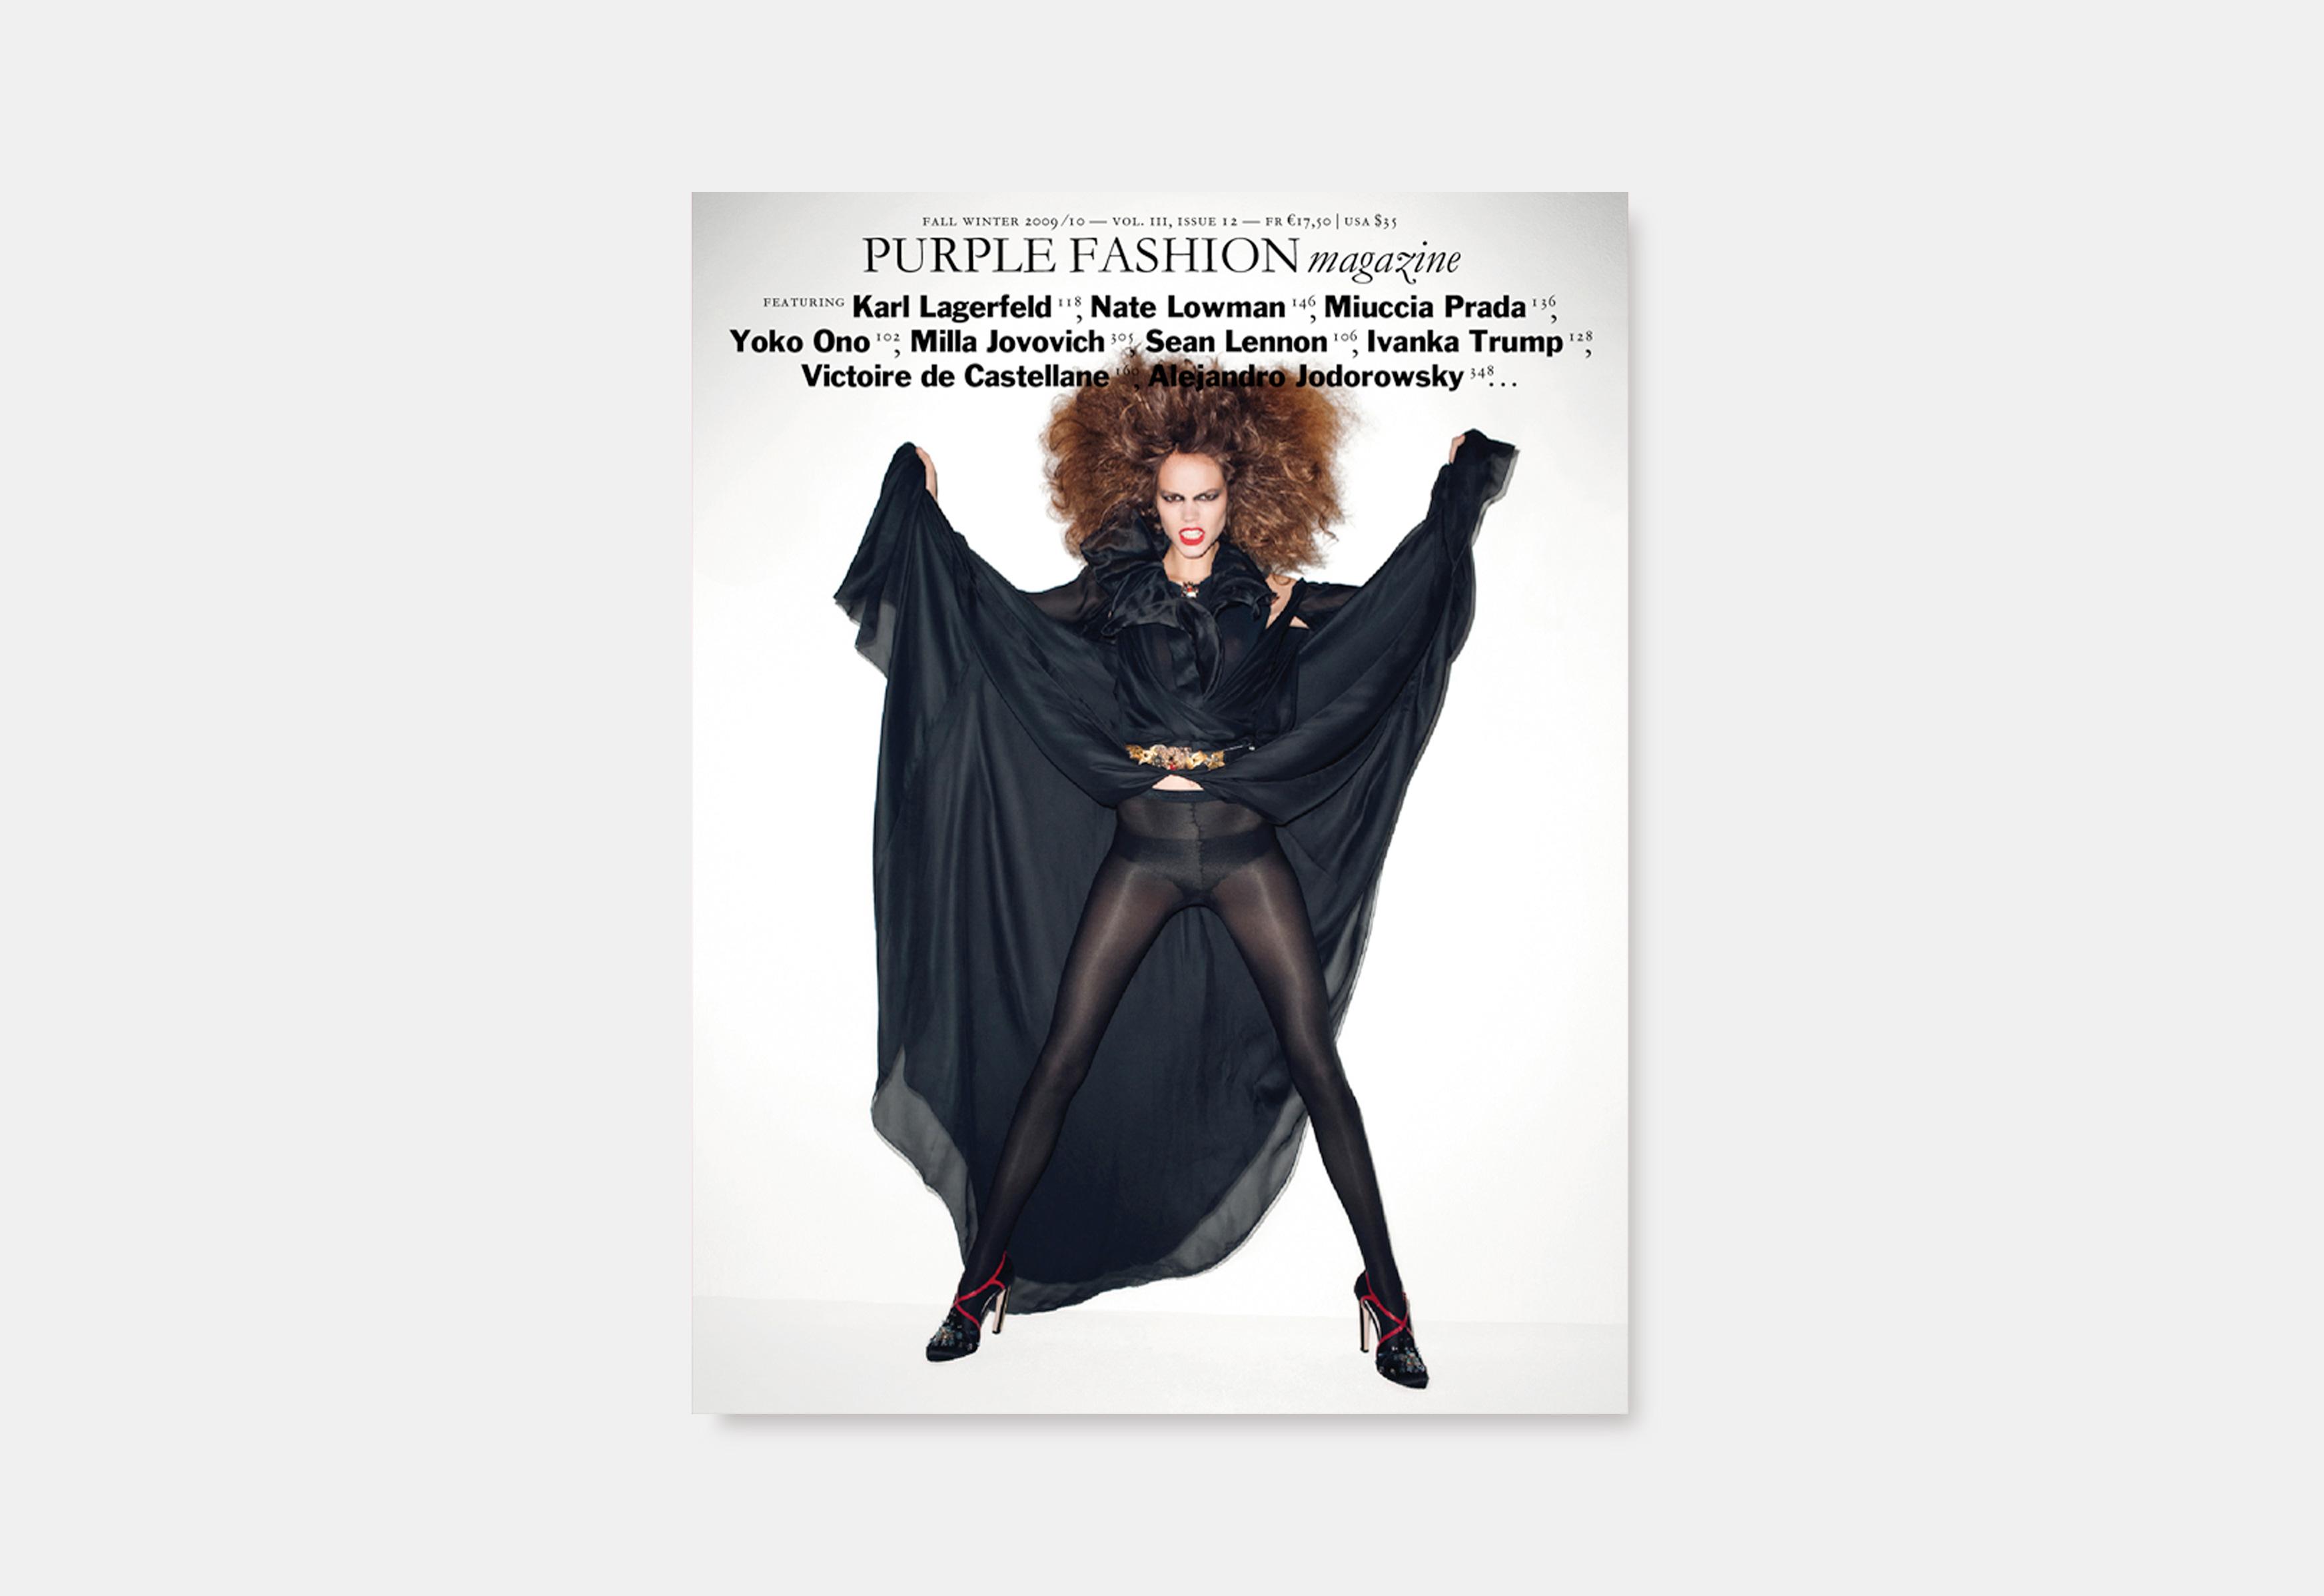 F/W 2009 issue 12